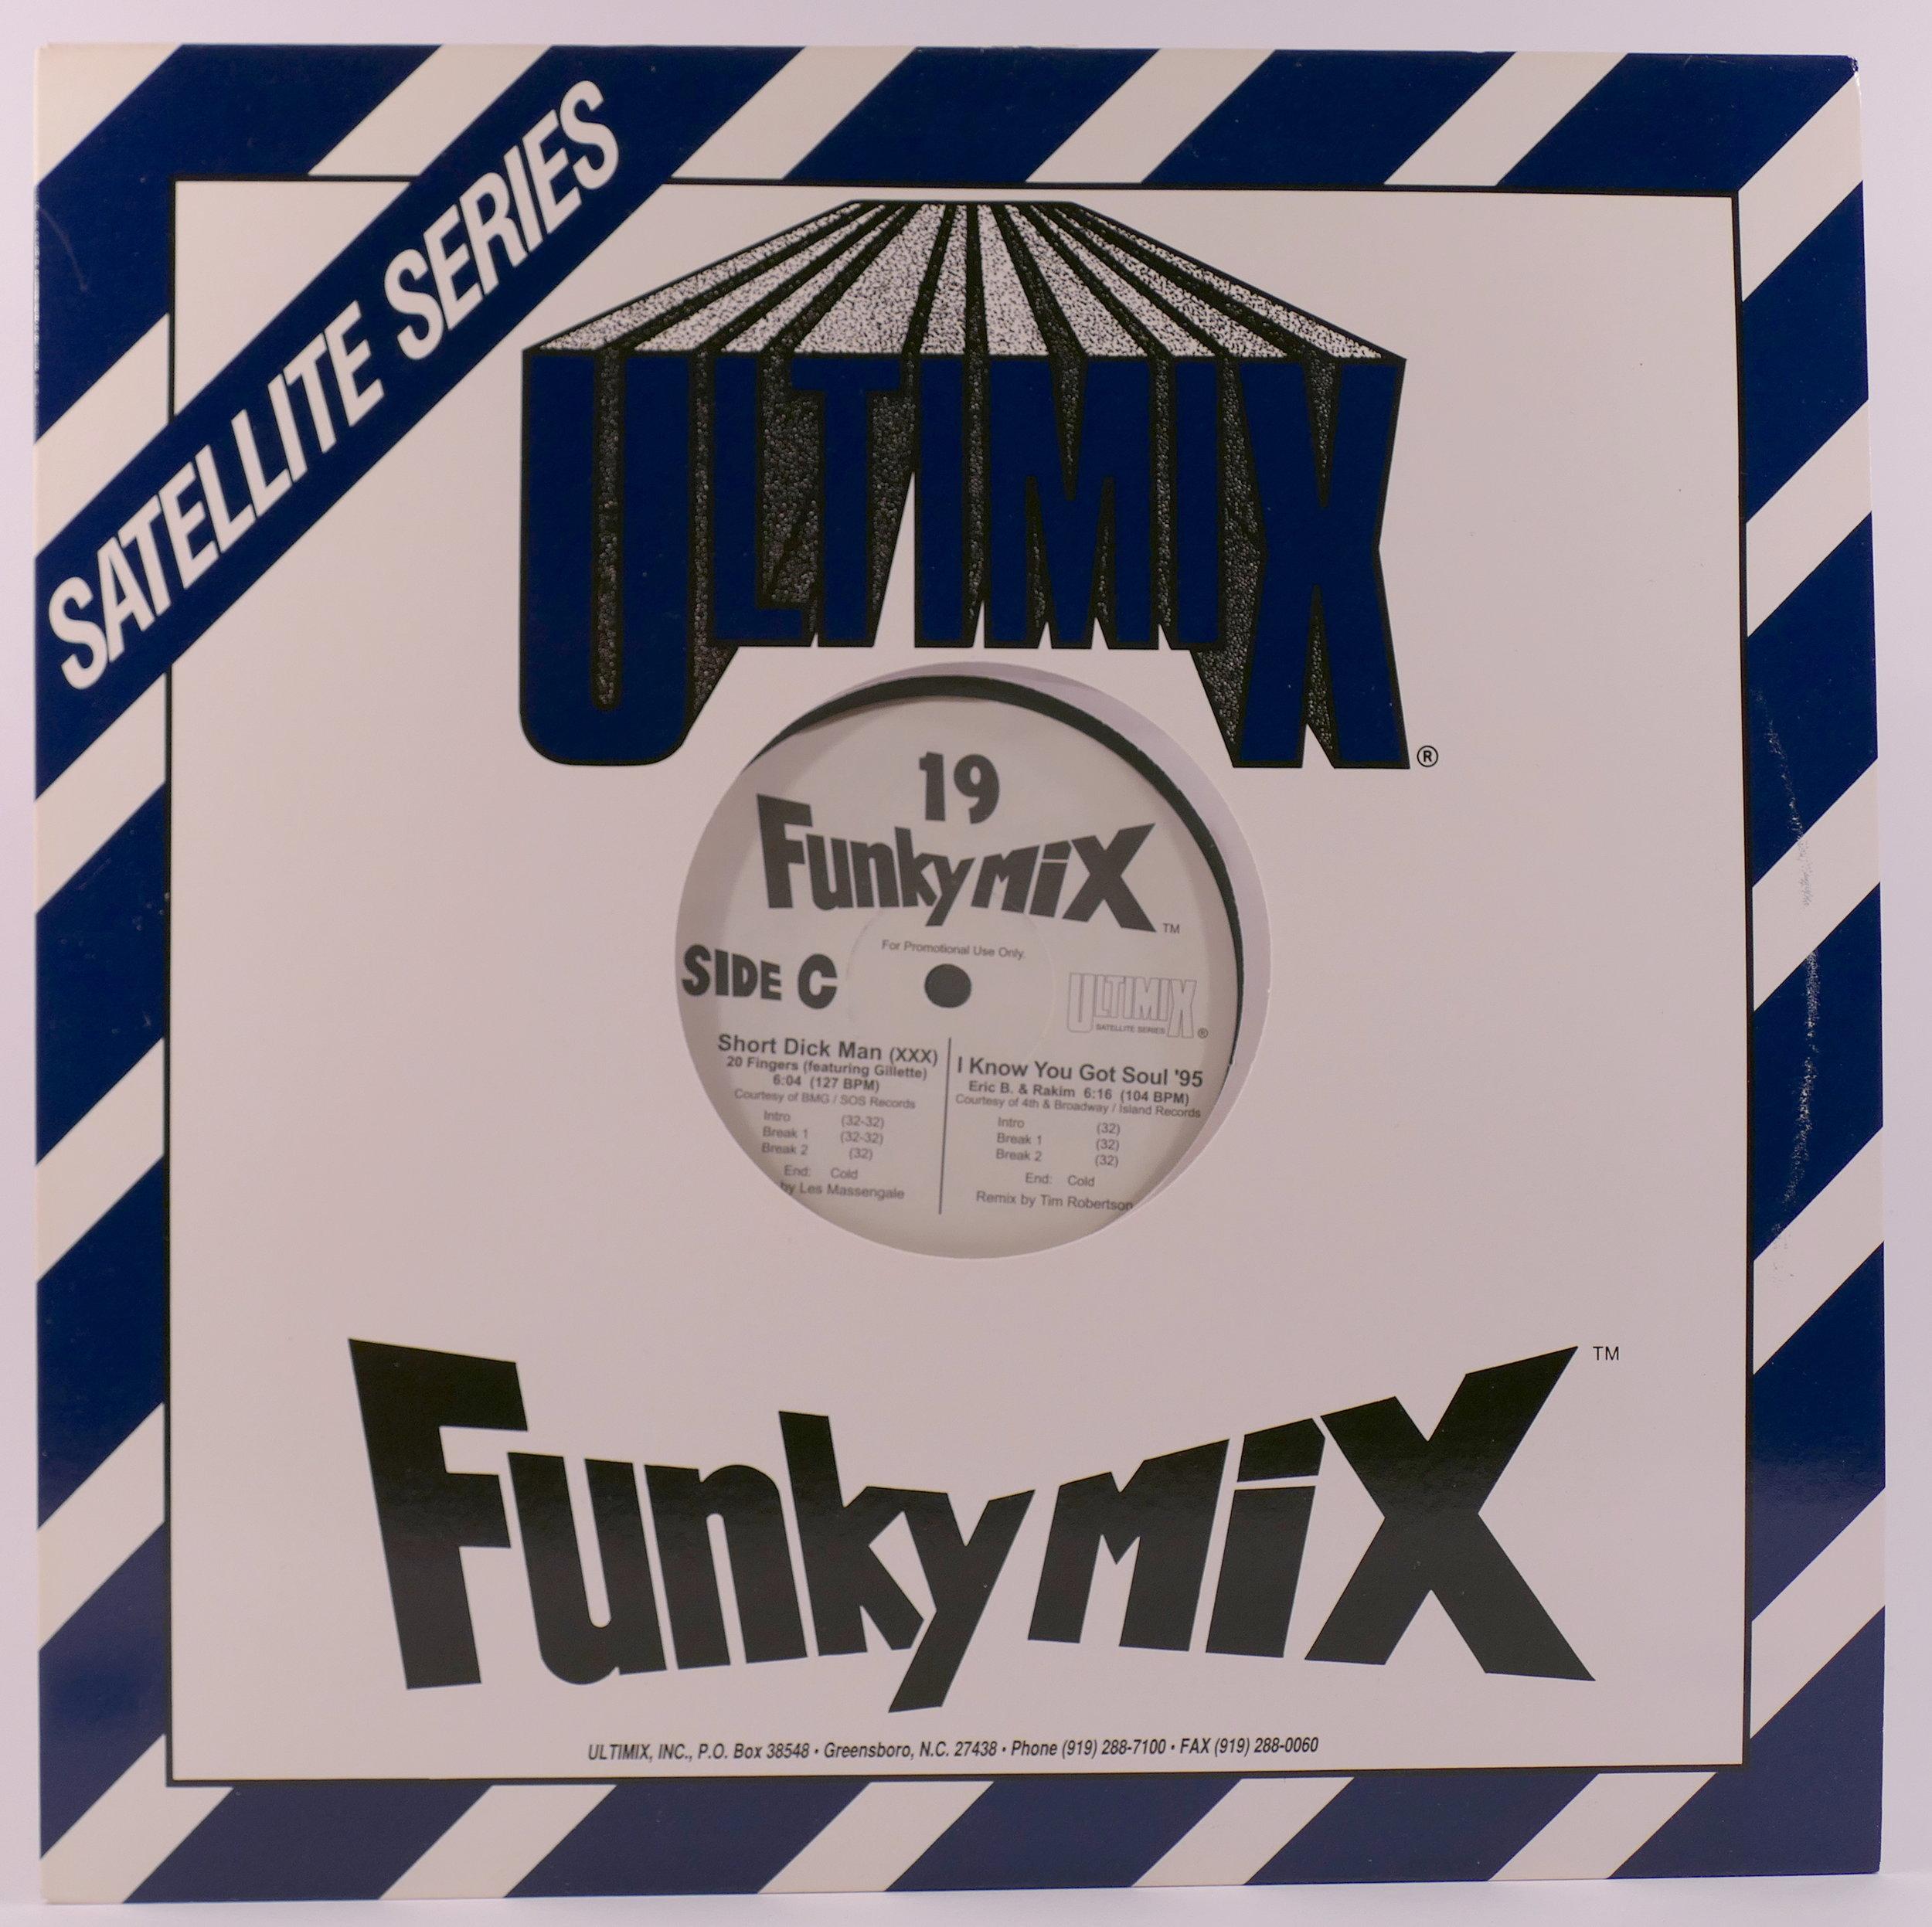 WLWLTDOO-1995-EP-FUNKYMIX19-C.JPG